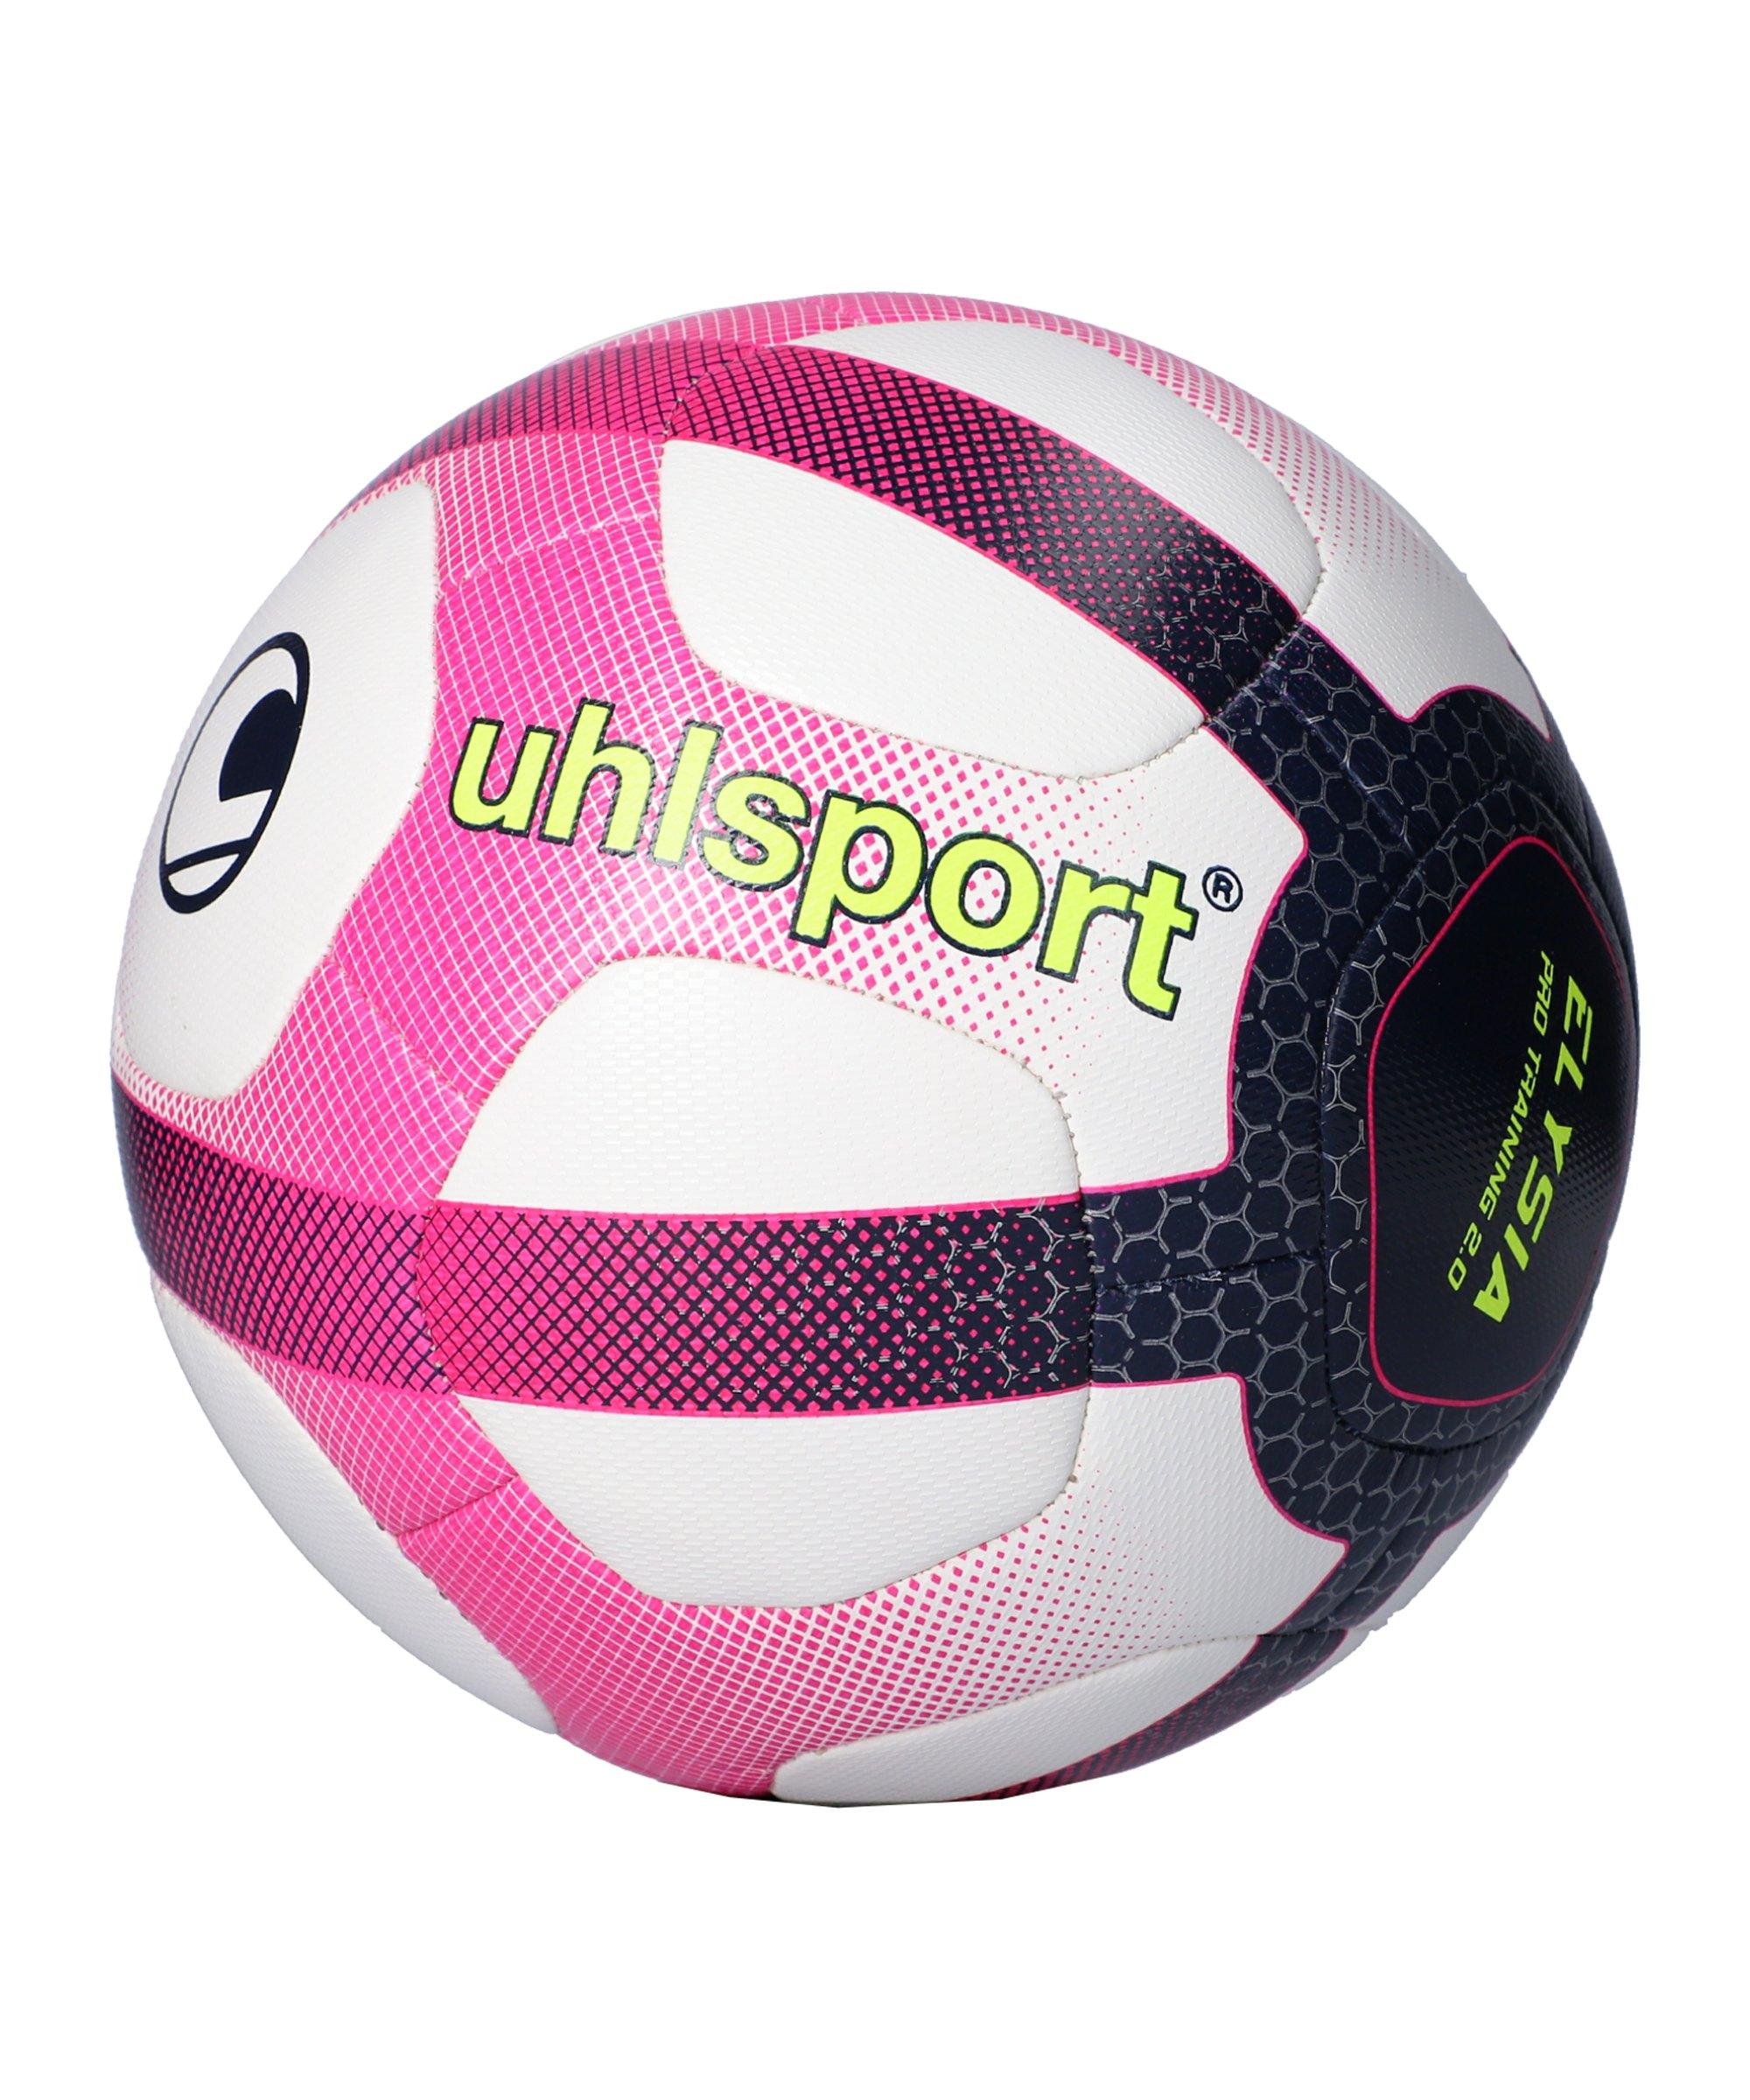 Uhlsport Elysia Pro Training 2.0 Gr.5 Weiss - weiss